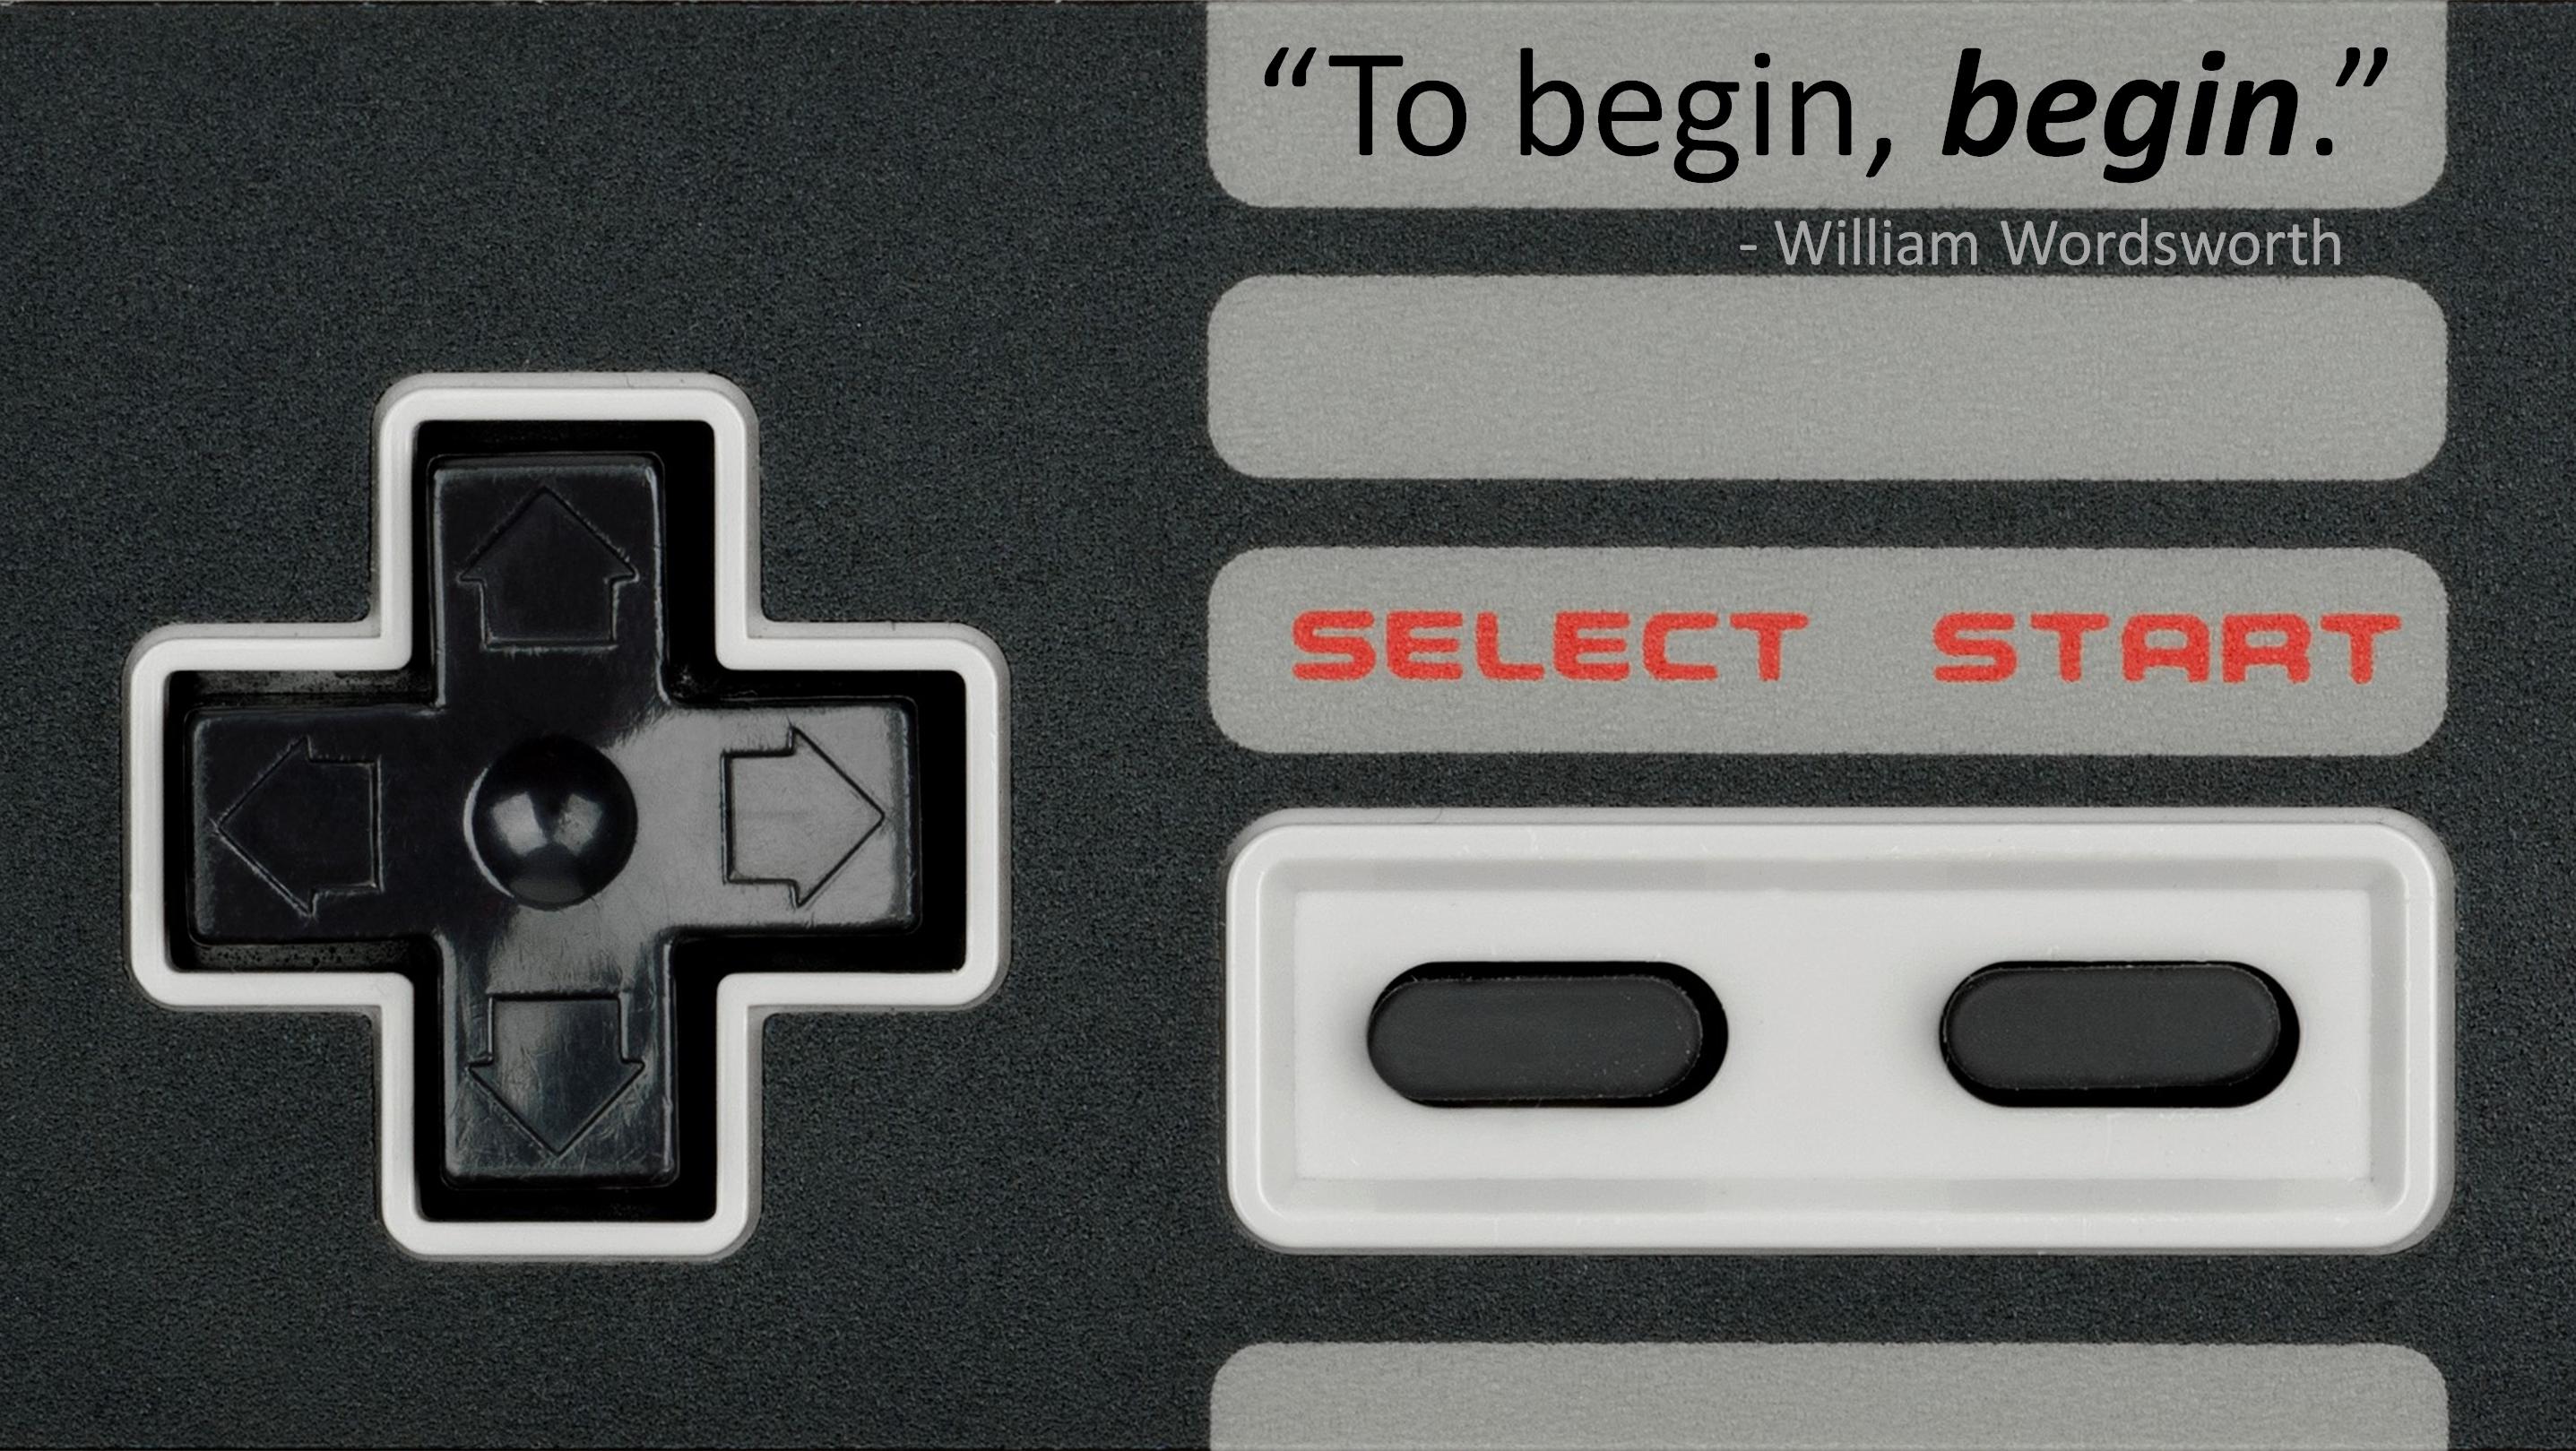 [Image] To begin, begin